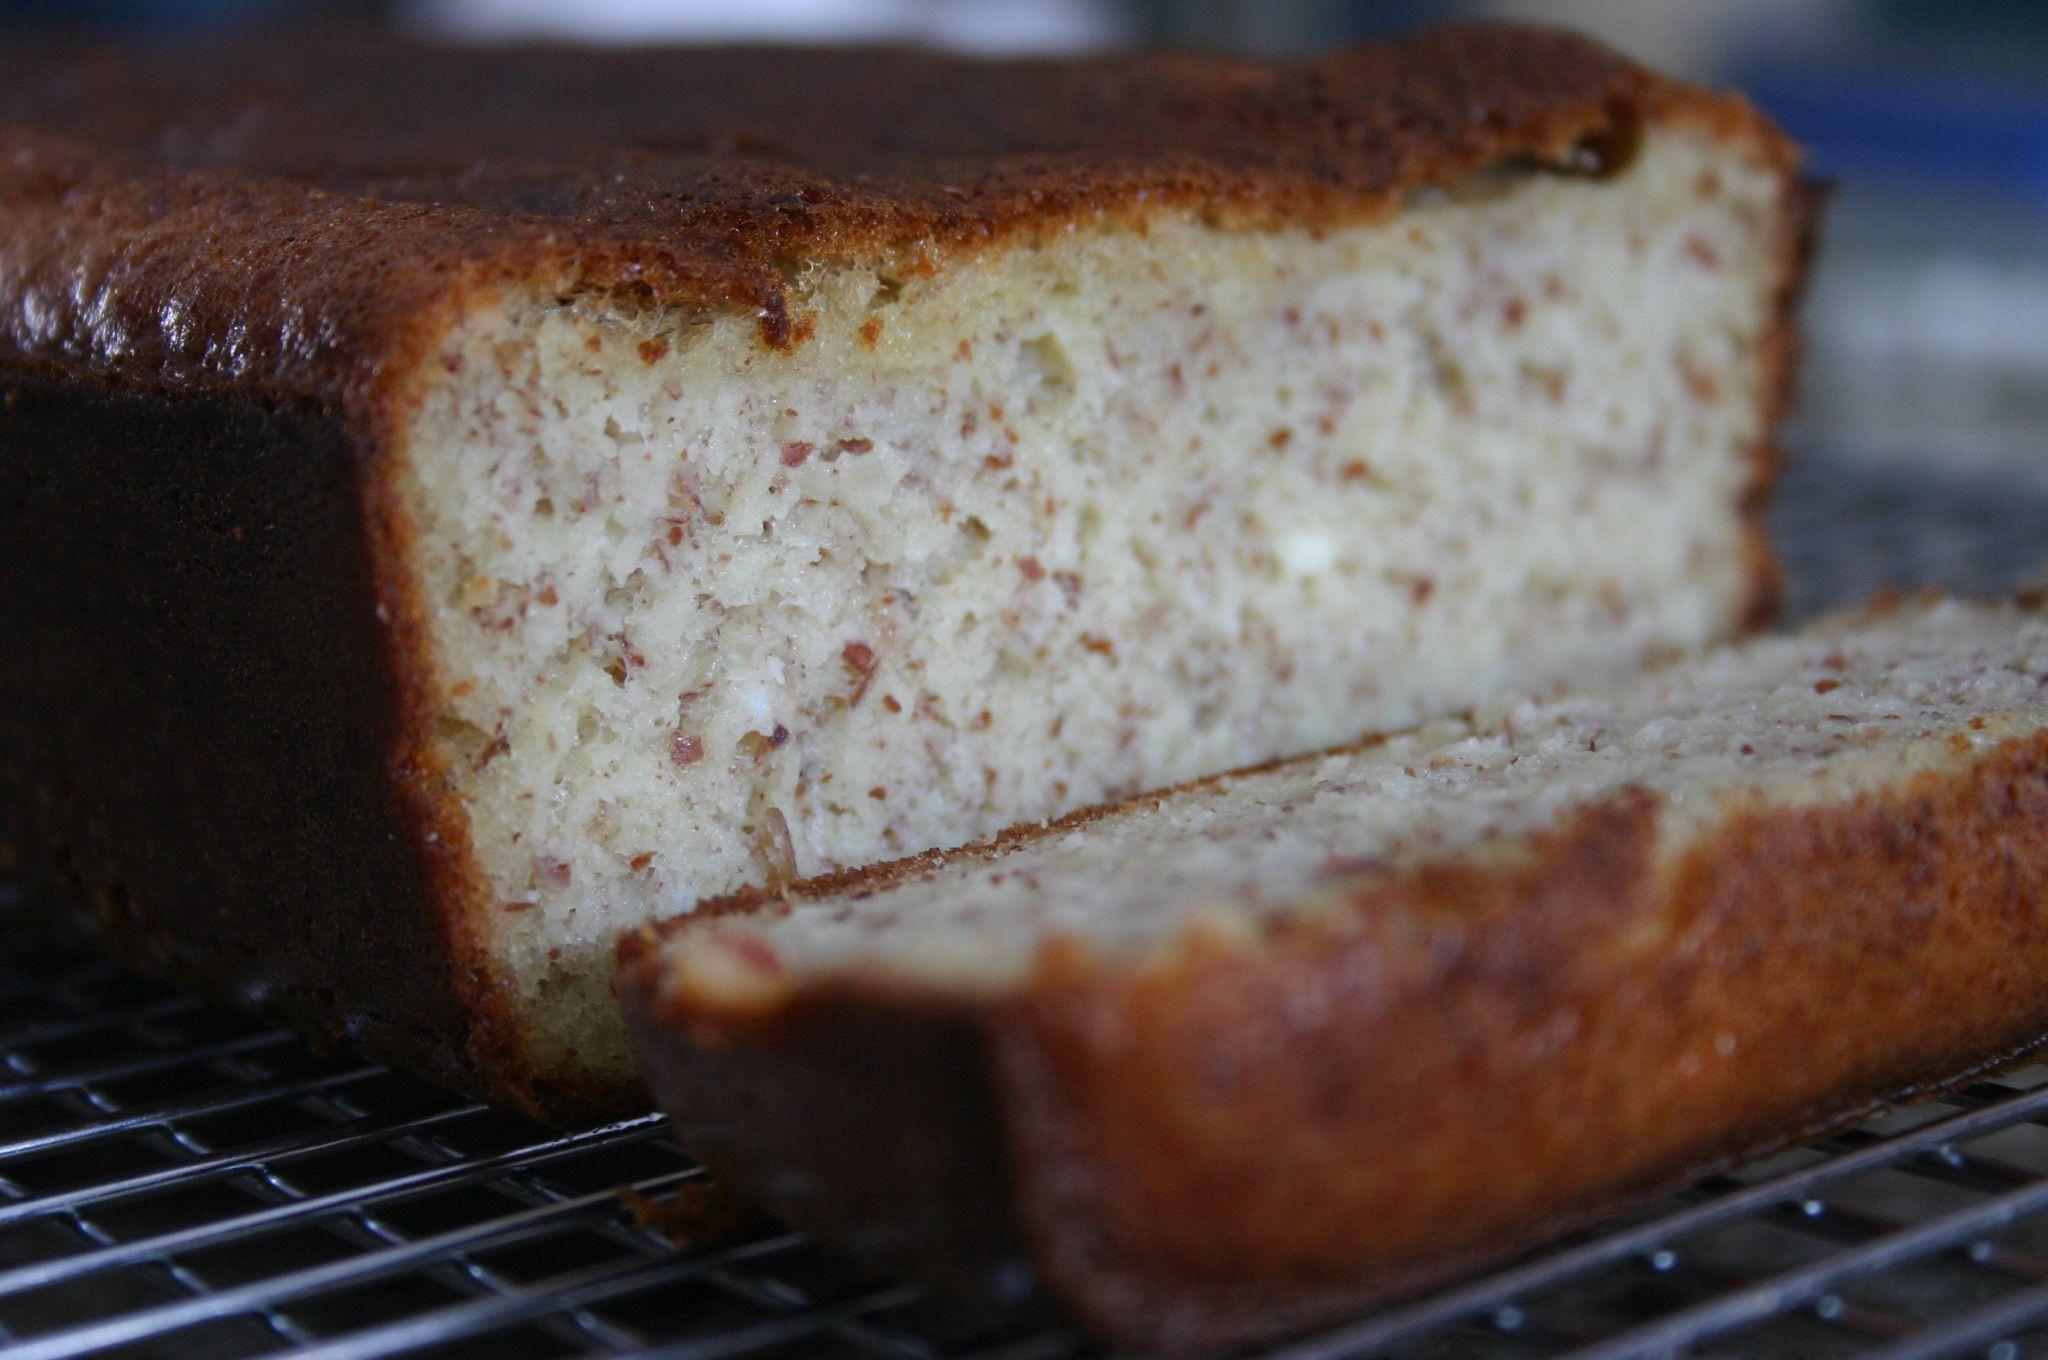 Pound Cake Recipe Low Fat: I Found This Low Carb Cream Cheese Pound Cake Recipe On